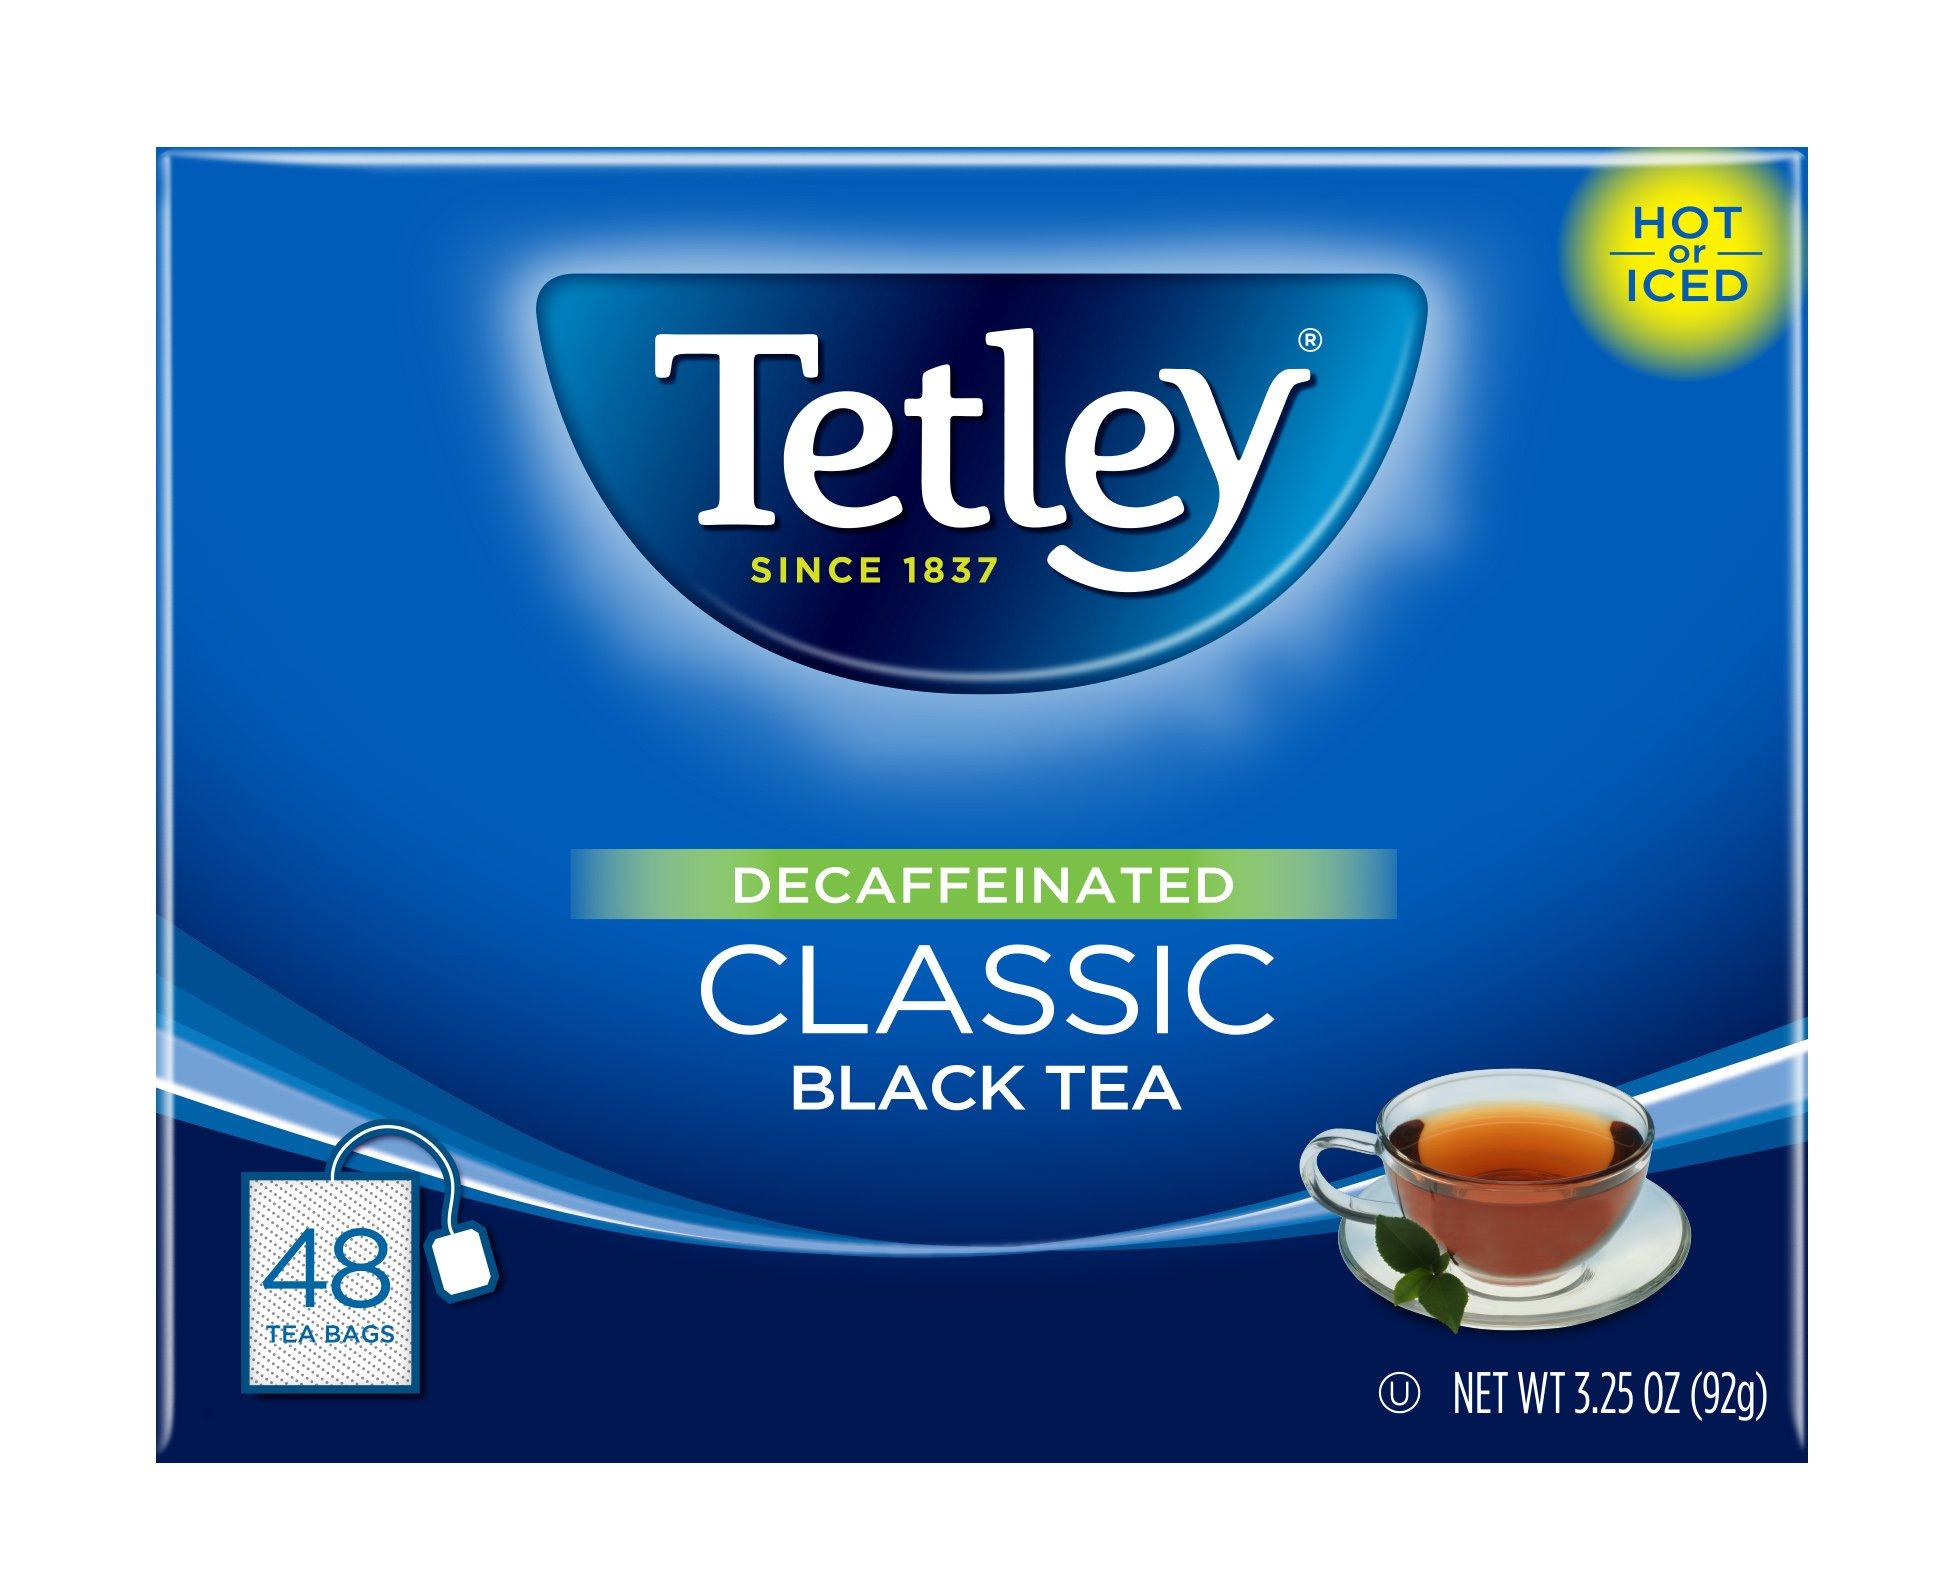 Tetley Black Tea, Decaffeinated Classic, 48 Tea Bags (Pack of 6)